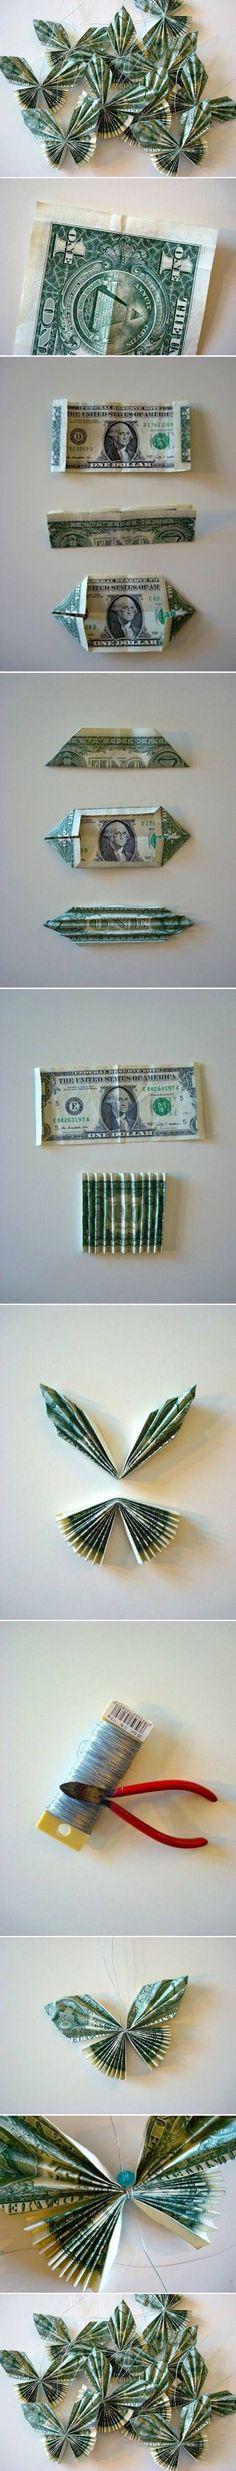 Geld geschenk schmetterling